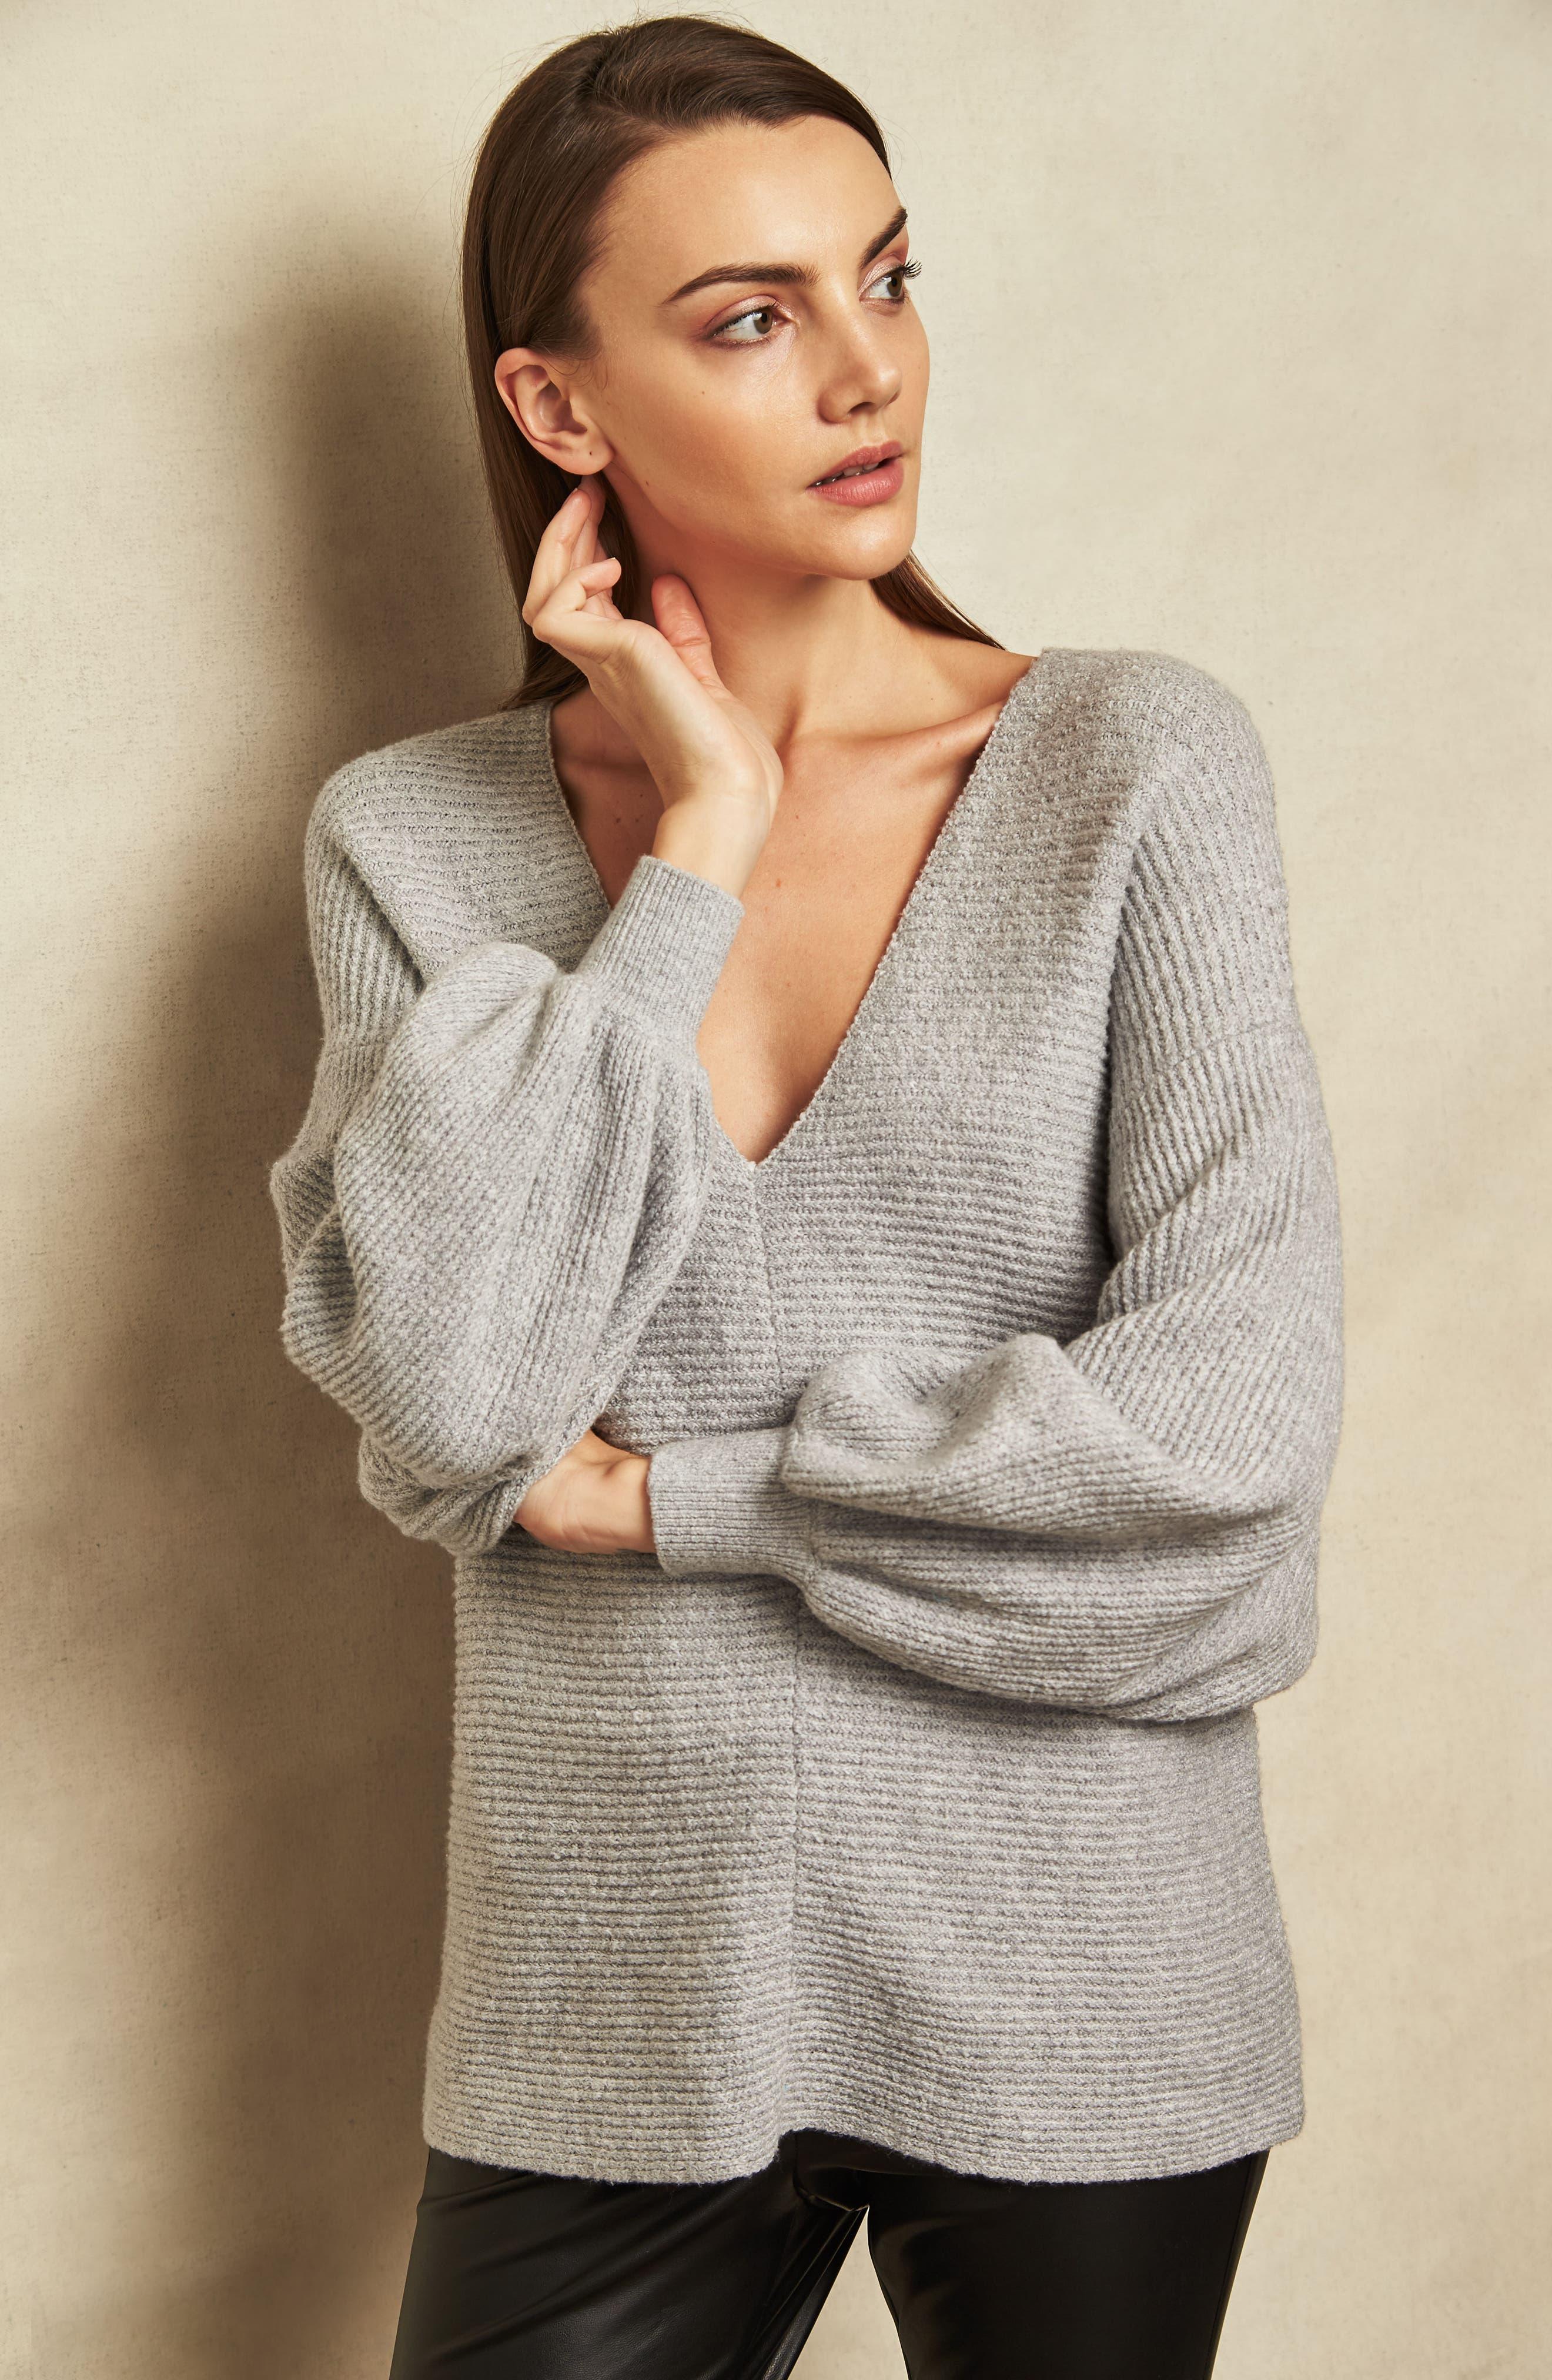 Blouson Sleeve V-Neck Sweater,                             Alternate thumbnail 4, color,                             LIGHT HEATHER GREY